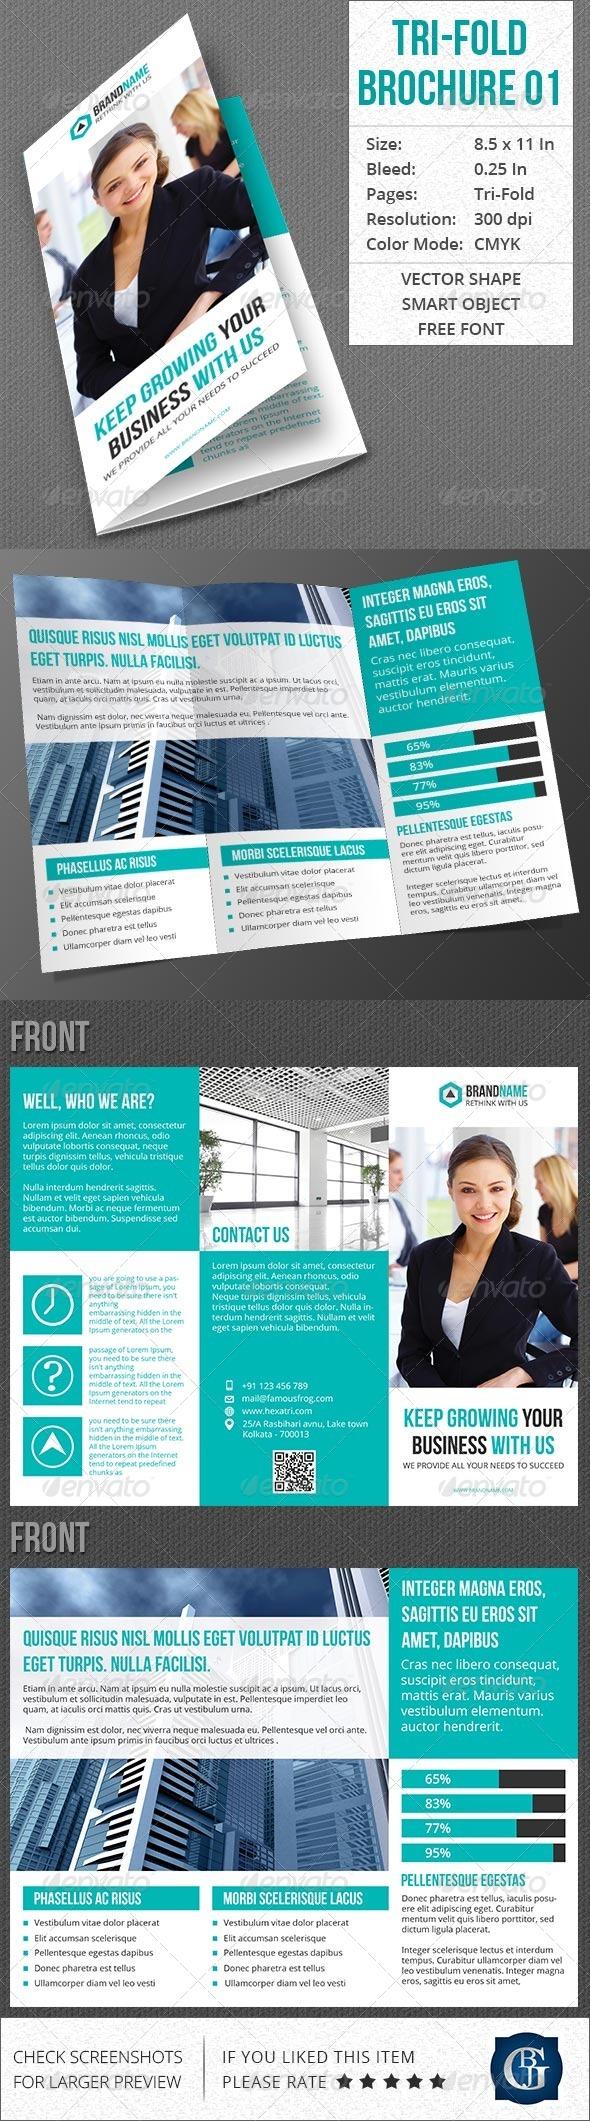 Corporate Multipurpose Trifold Brochure Vol 1 - Corporate Brochures